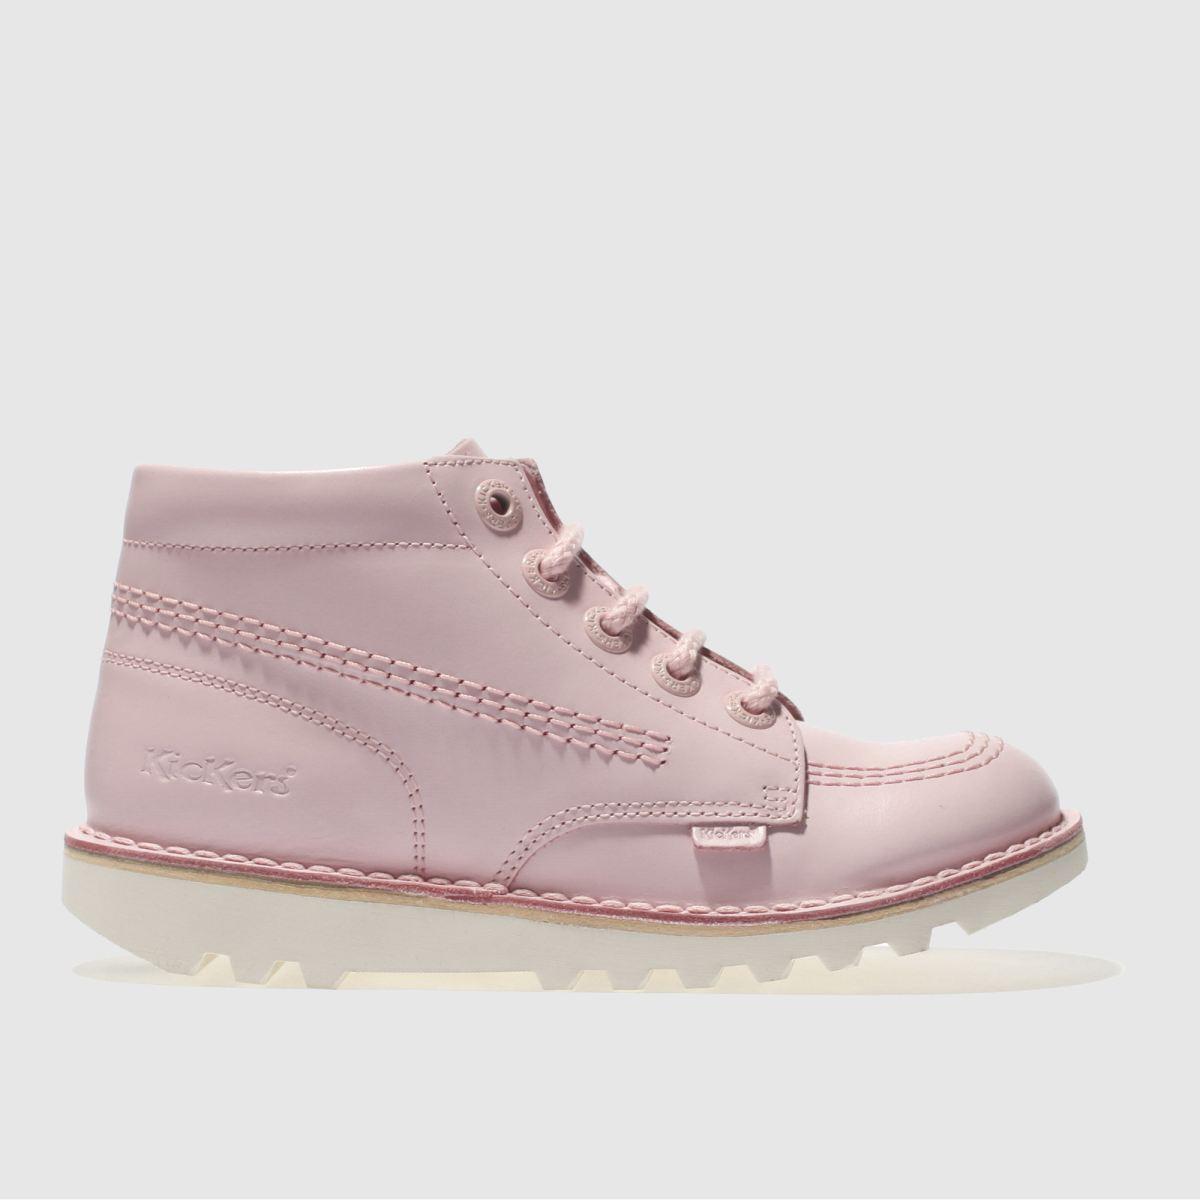 Kickers Pale Pink Kick Hi Girls Junior Boots